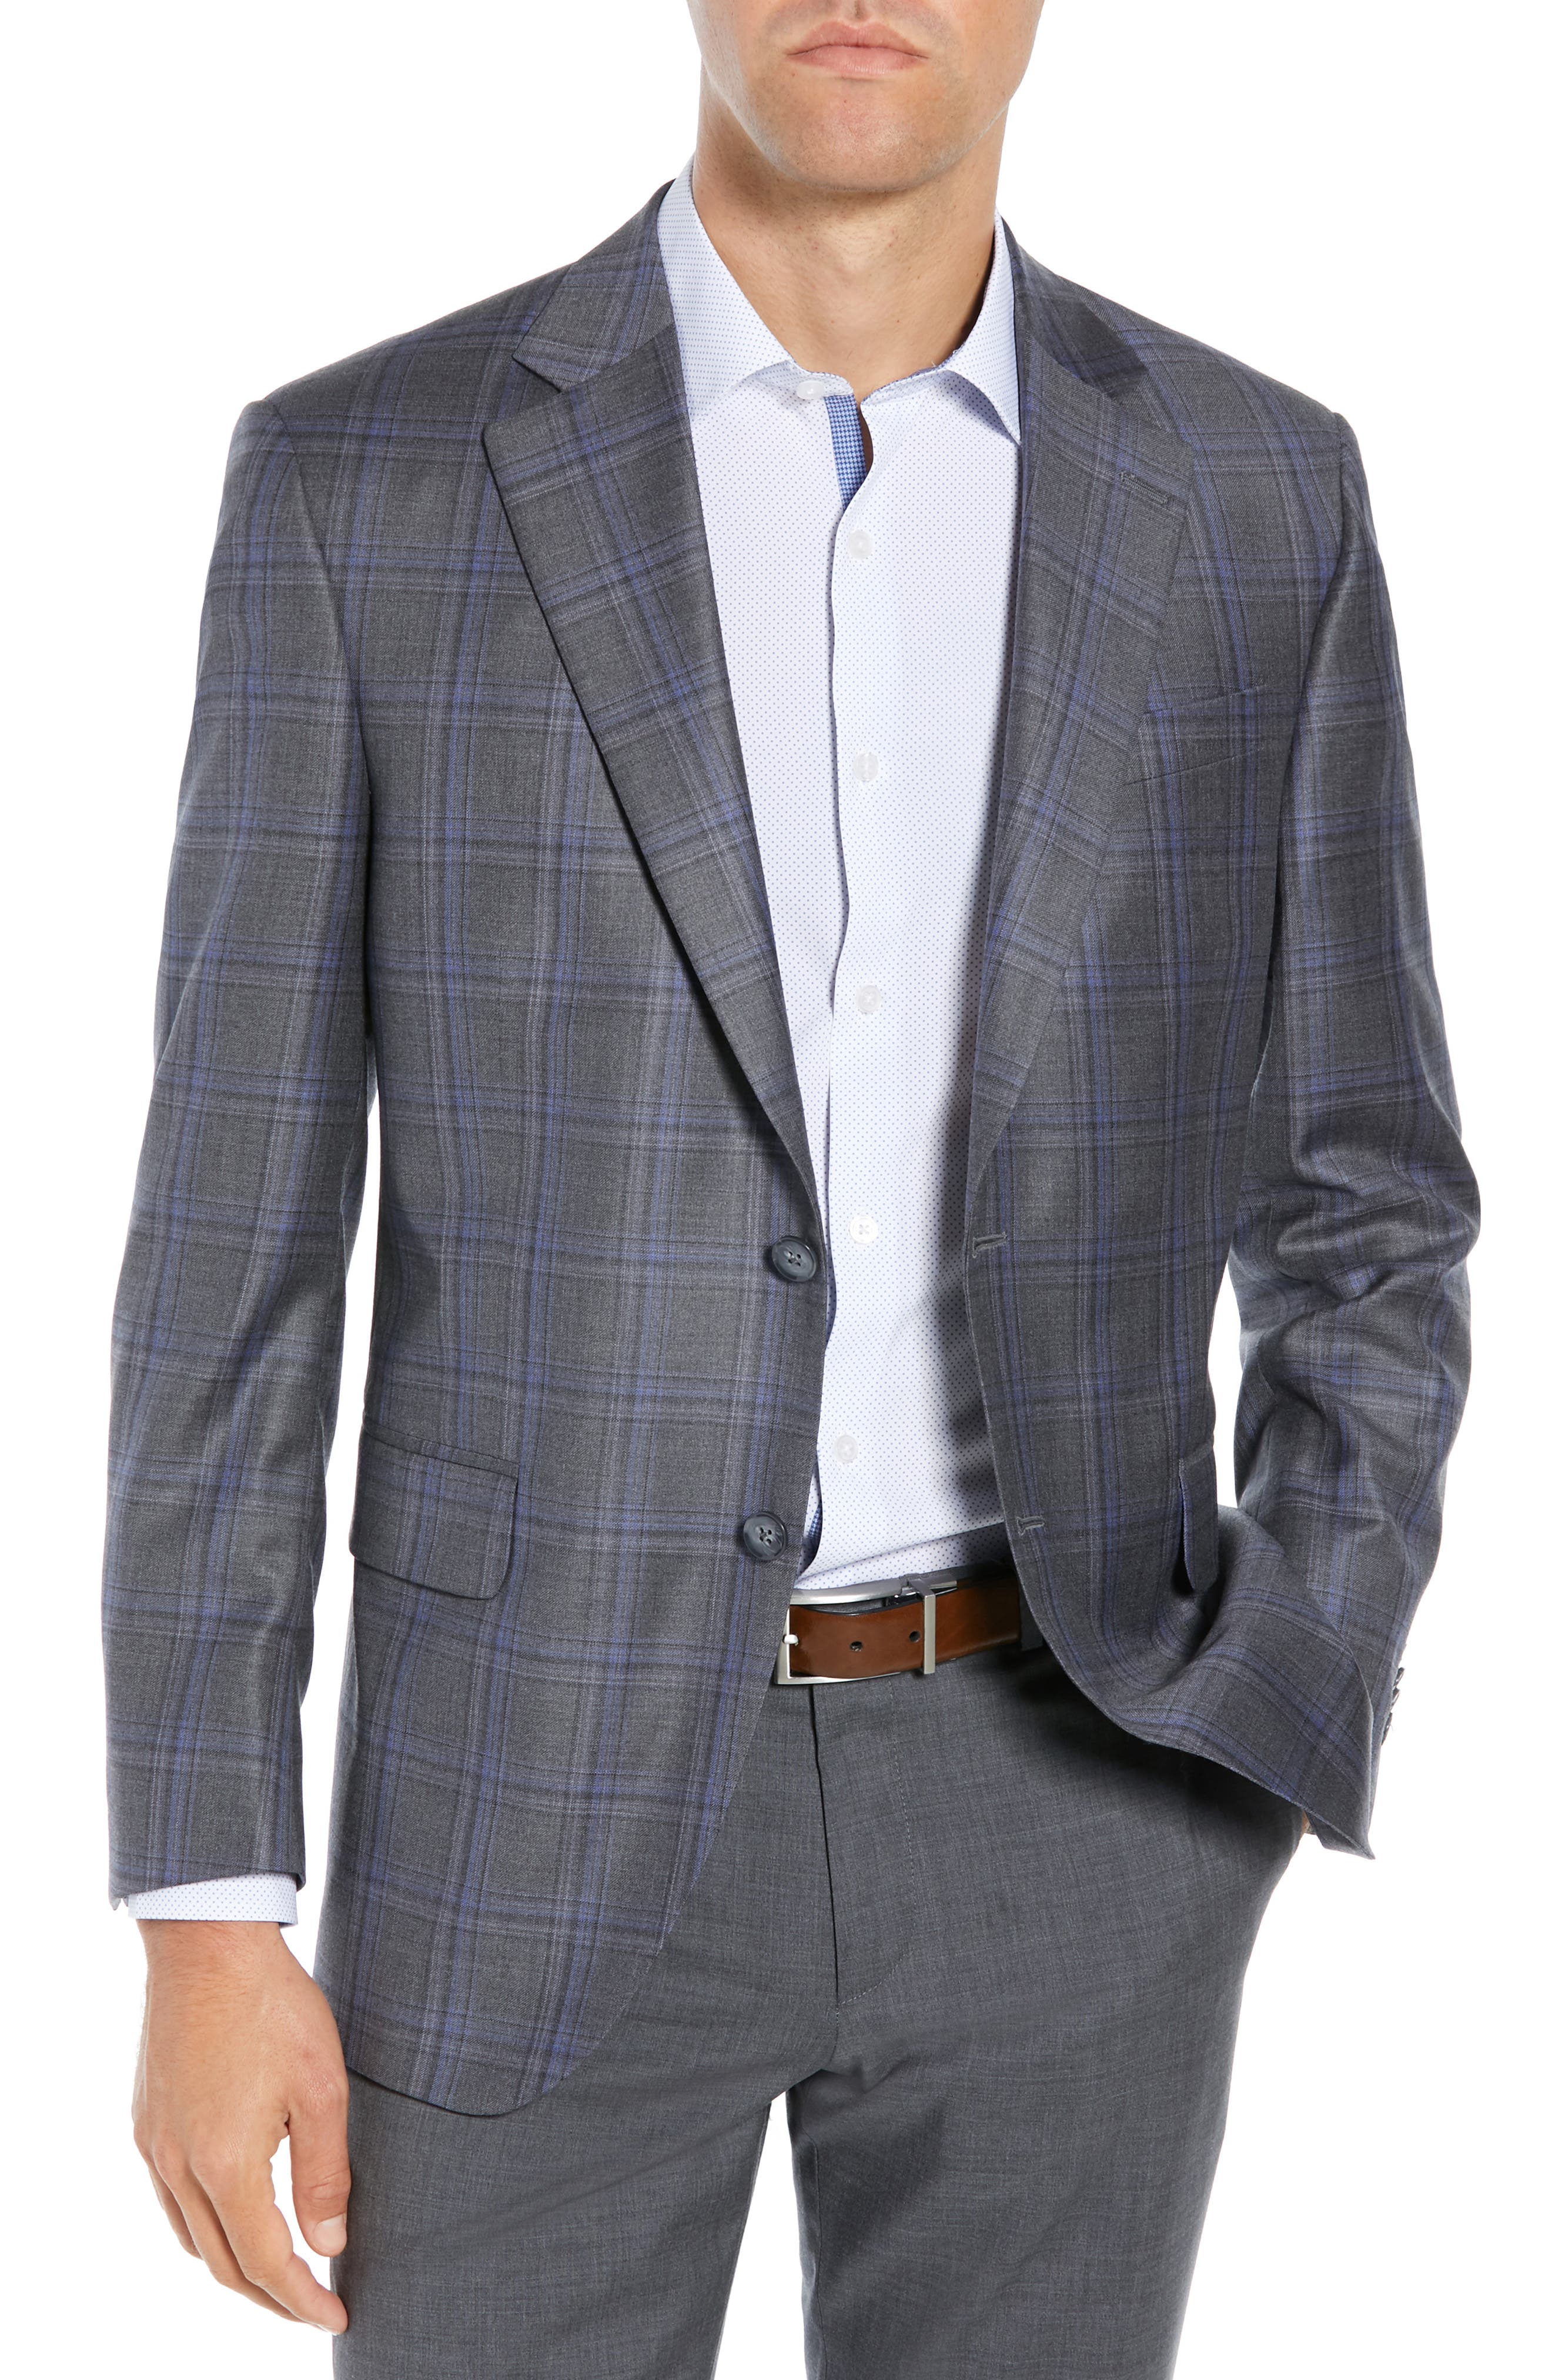 PETER MILLAR, Classic Fit Grey Plaid Sport Coat, Main thumbnail 1, color, GREY